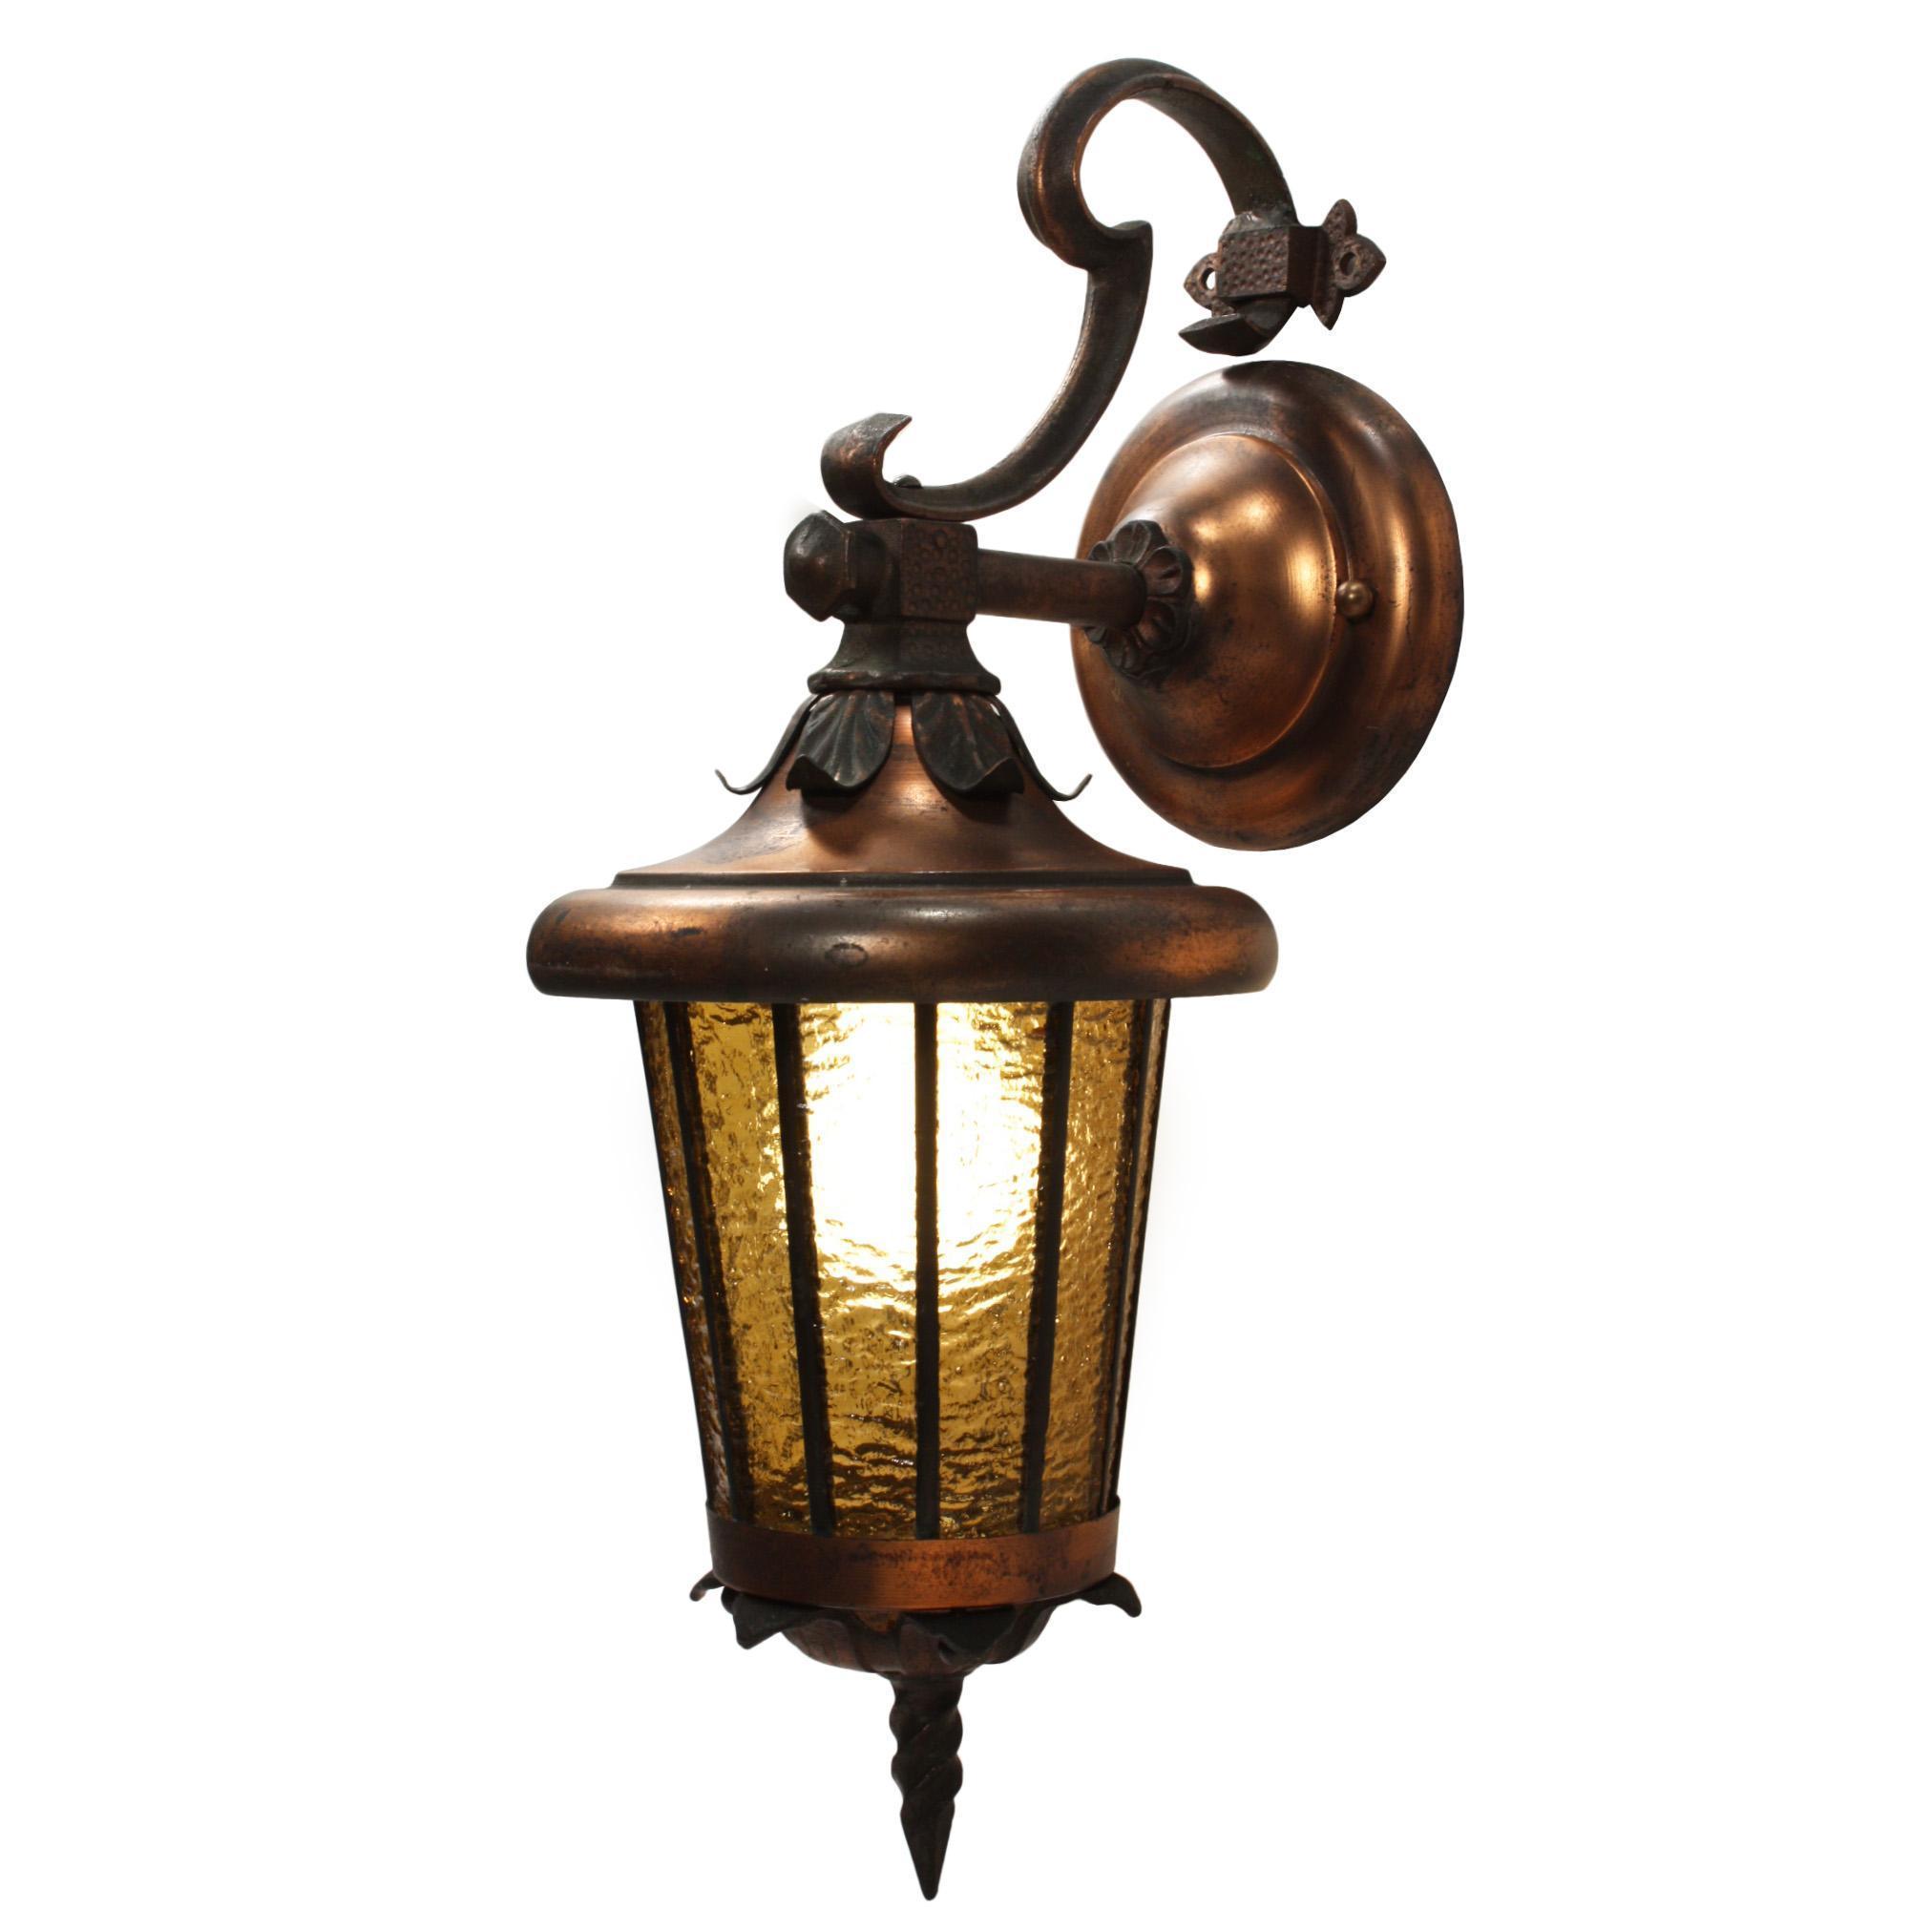 Antique Tudor Lantern with Original Glass, Early 1900's